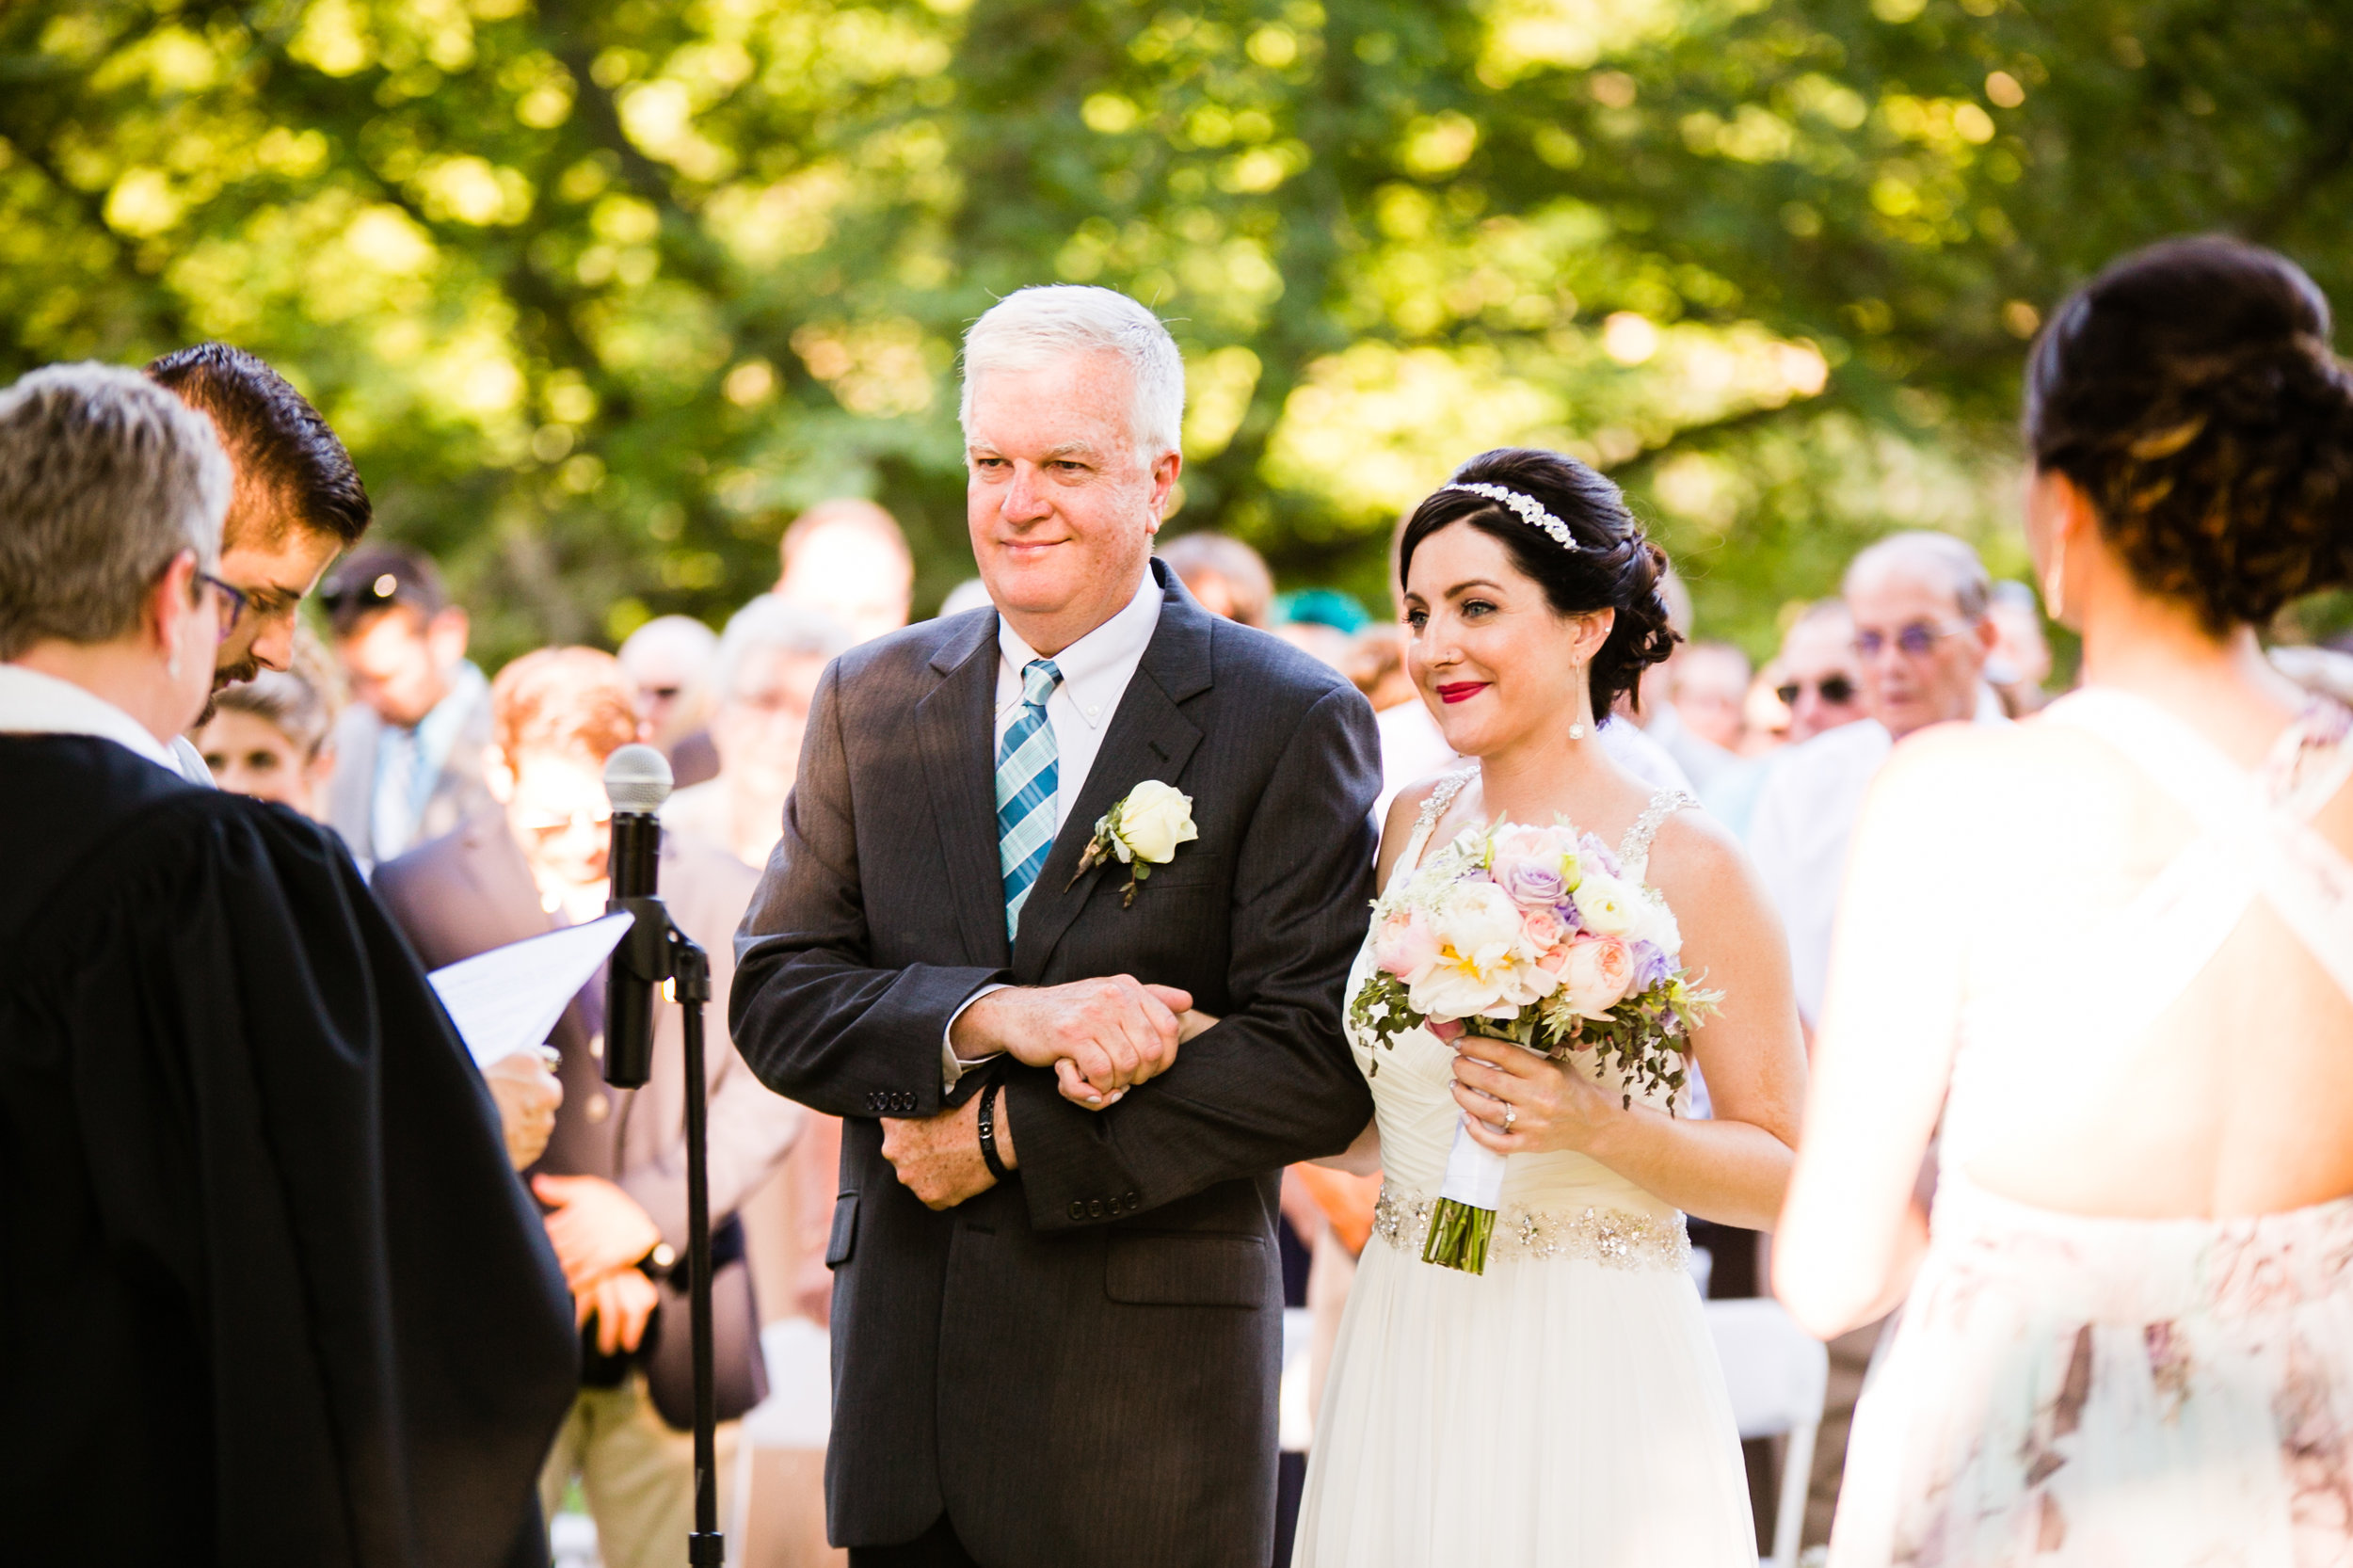 TYLER ARBORETUM WEDDING PHOTOGRAPHY LOVESTRUCK PICTURES-050.jpg